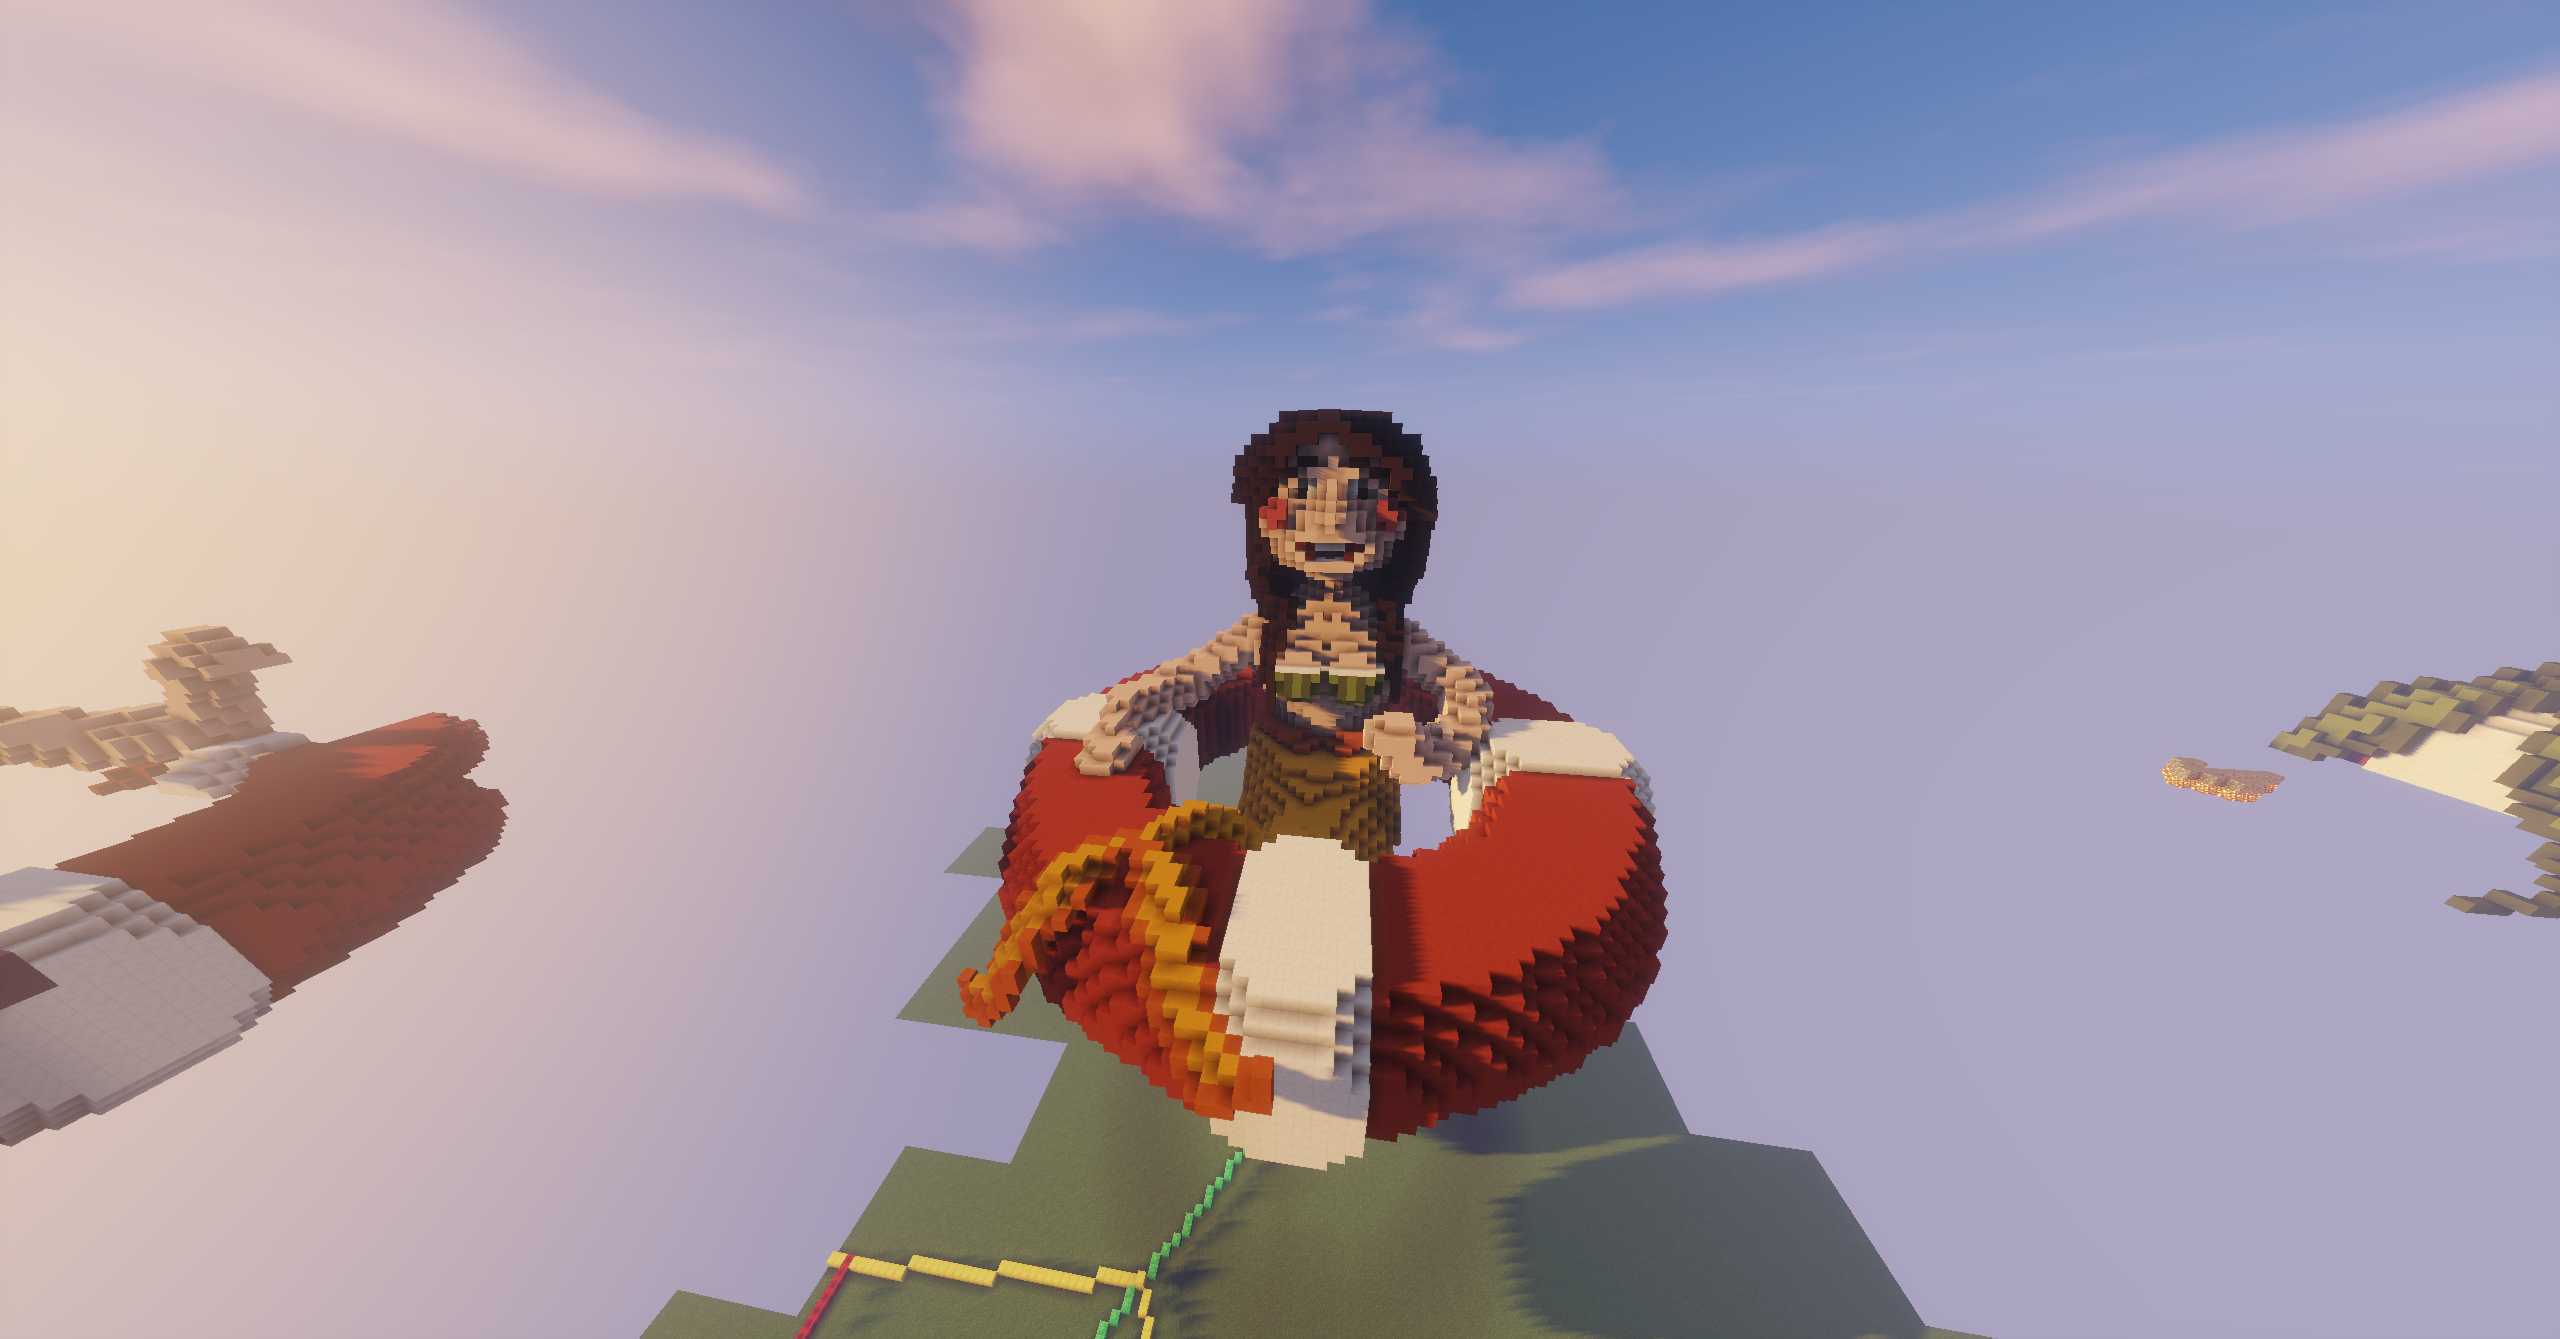 #Minecraft #Mermaid #Building #Lollyherz #Italian #Builder #Sirena #Beach